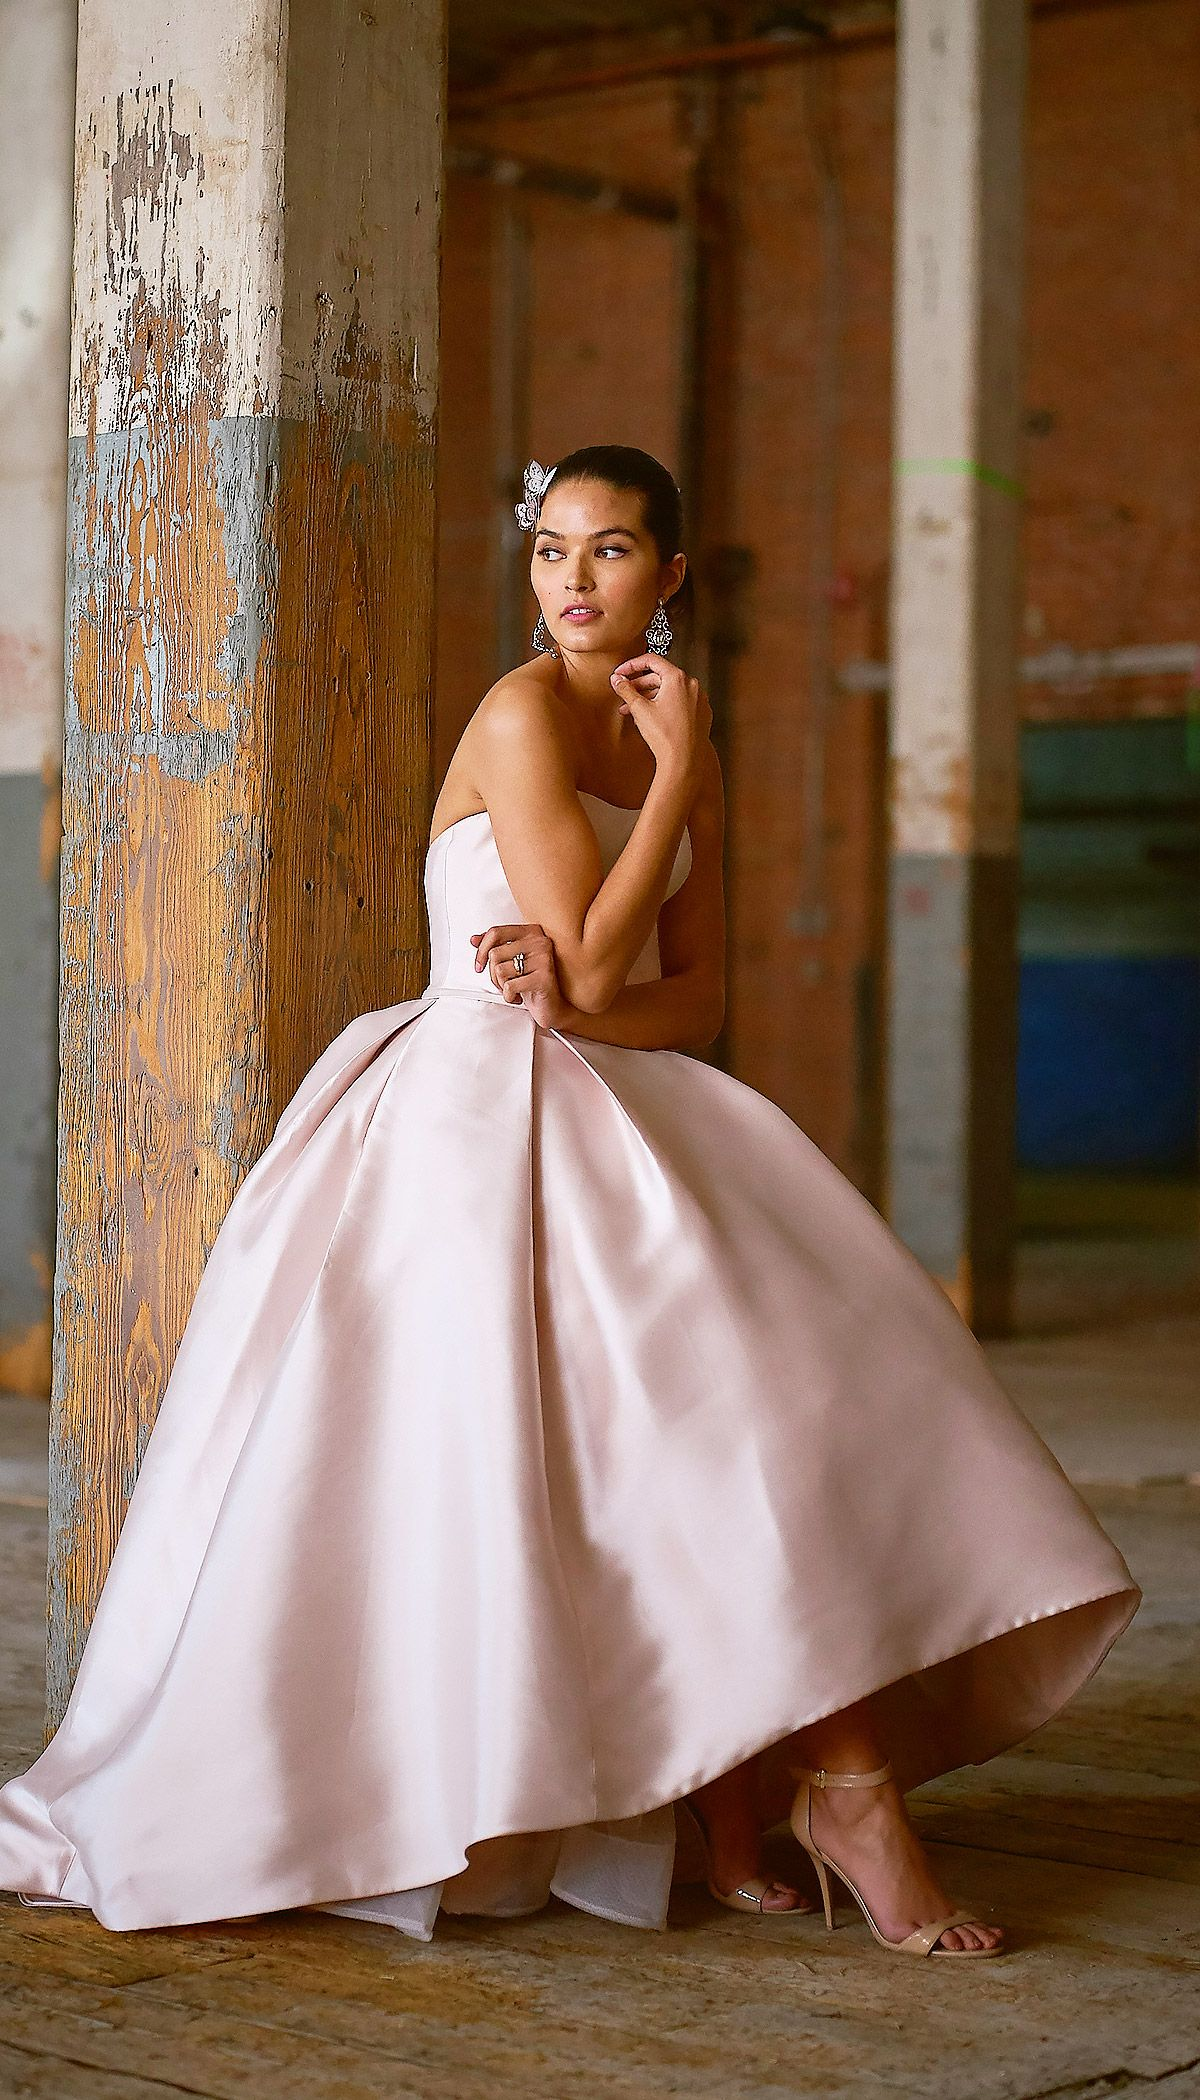 Erica by rebecca ingram wedding dresses in 2020 wedding